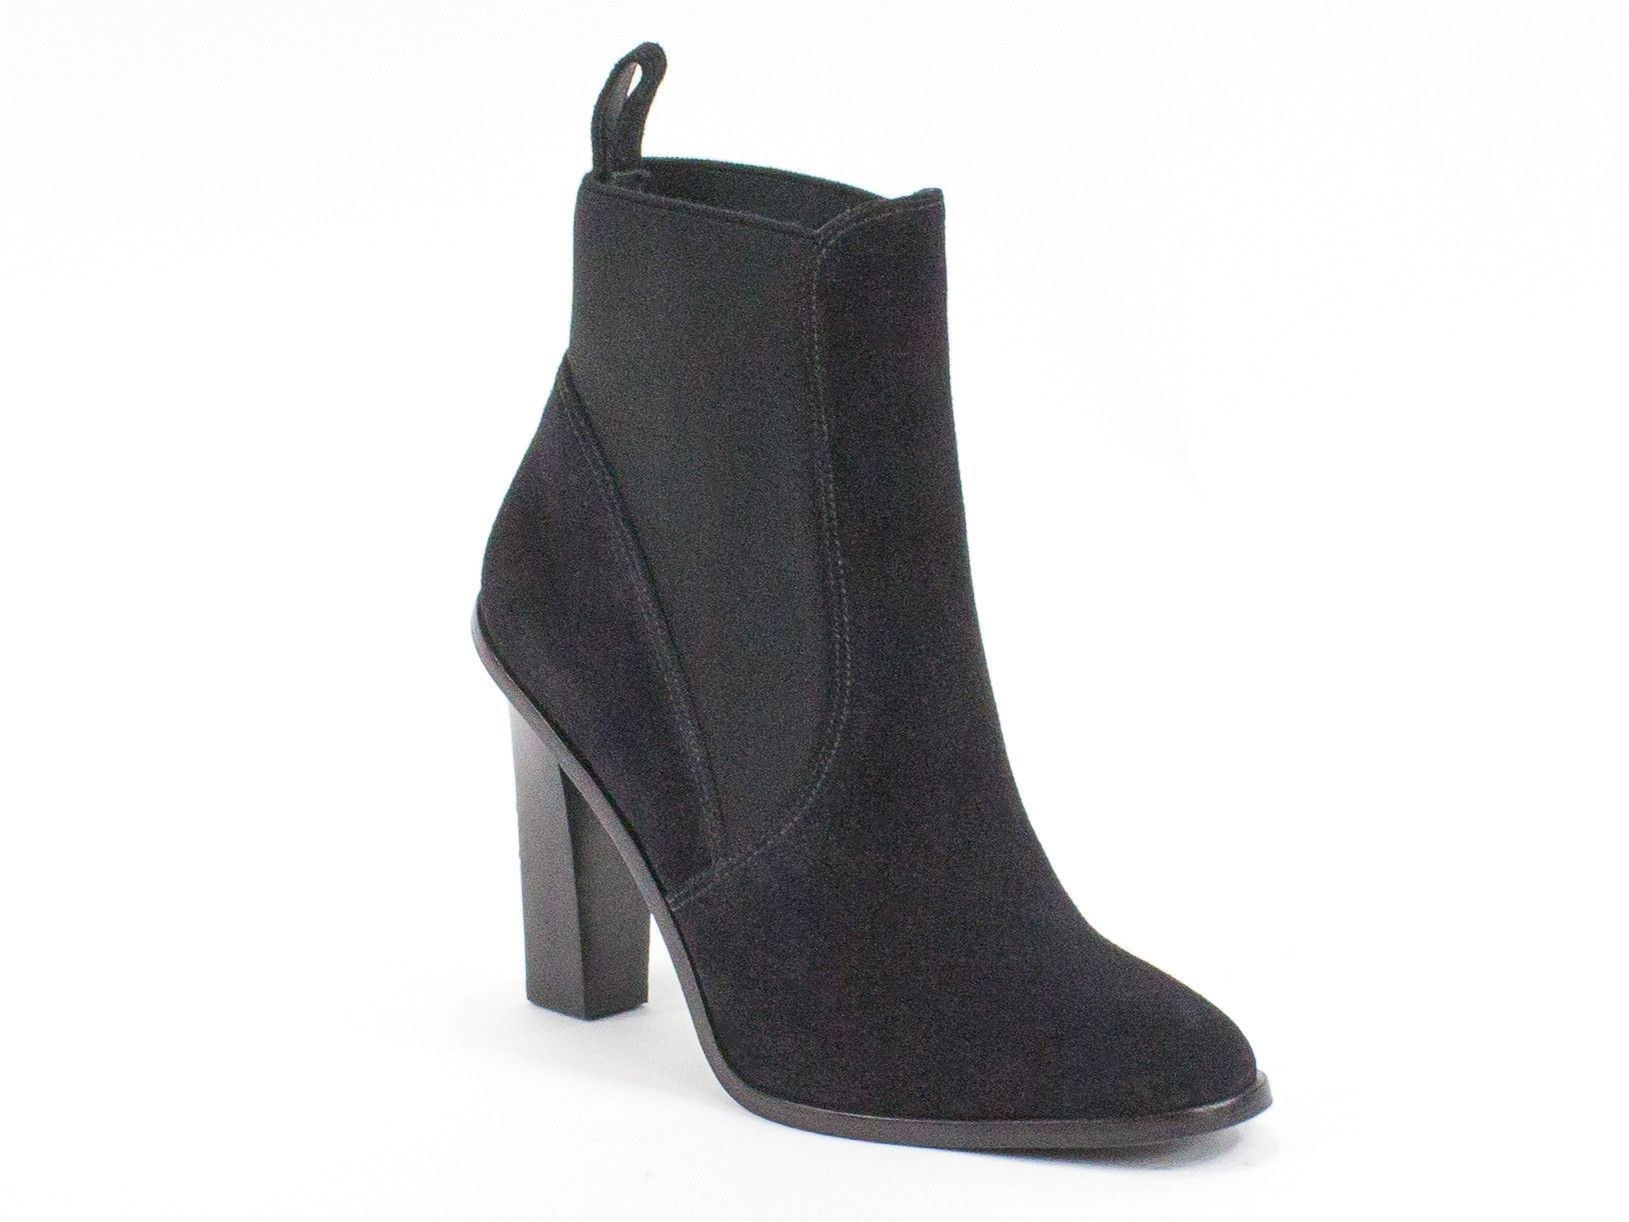 Via Spiga Maila Ankle Boots